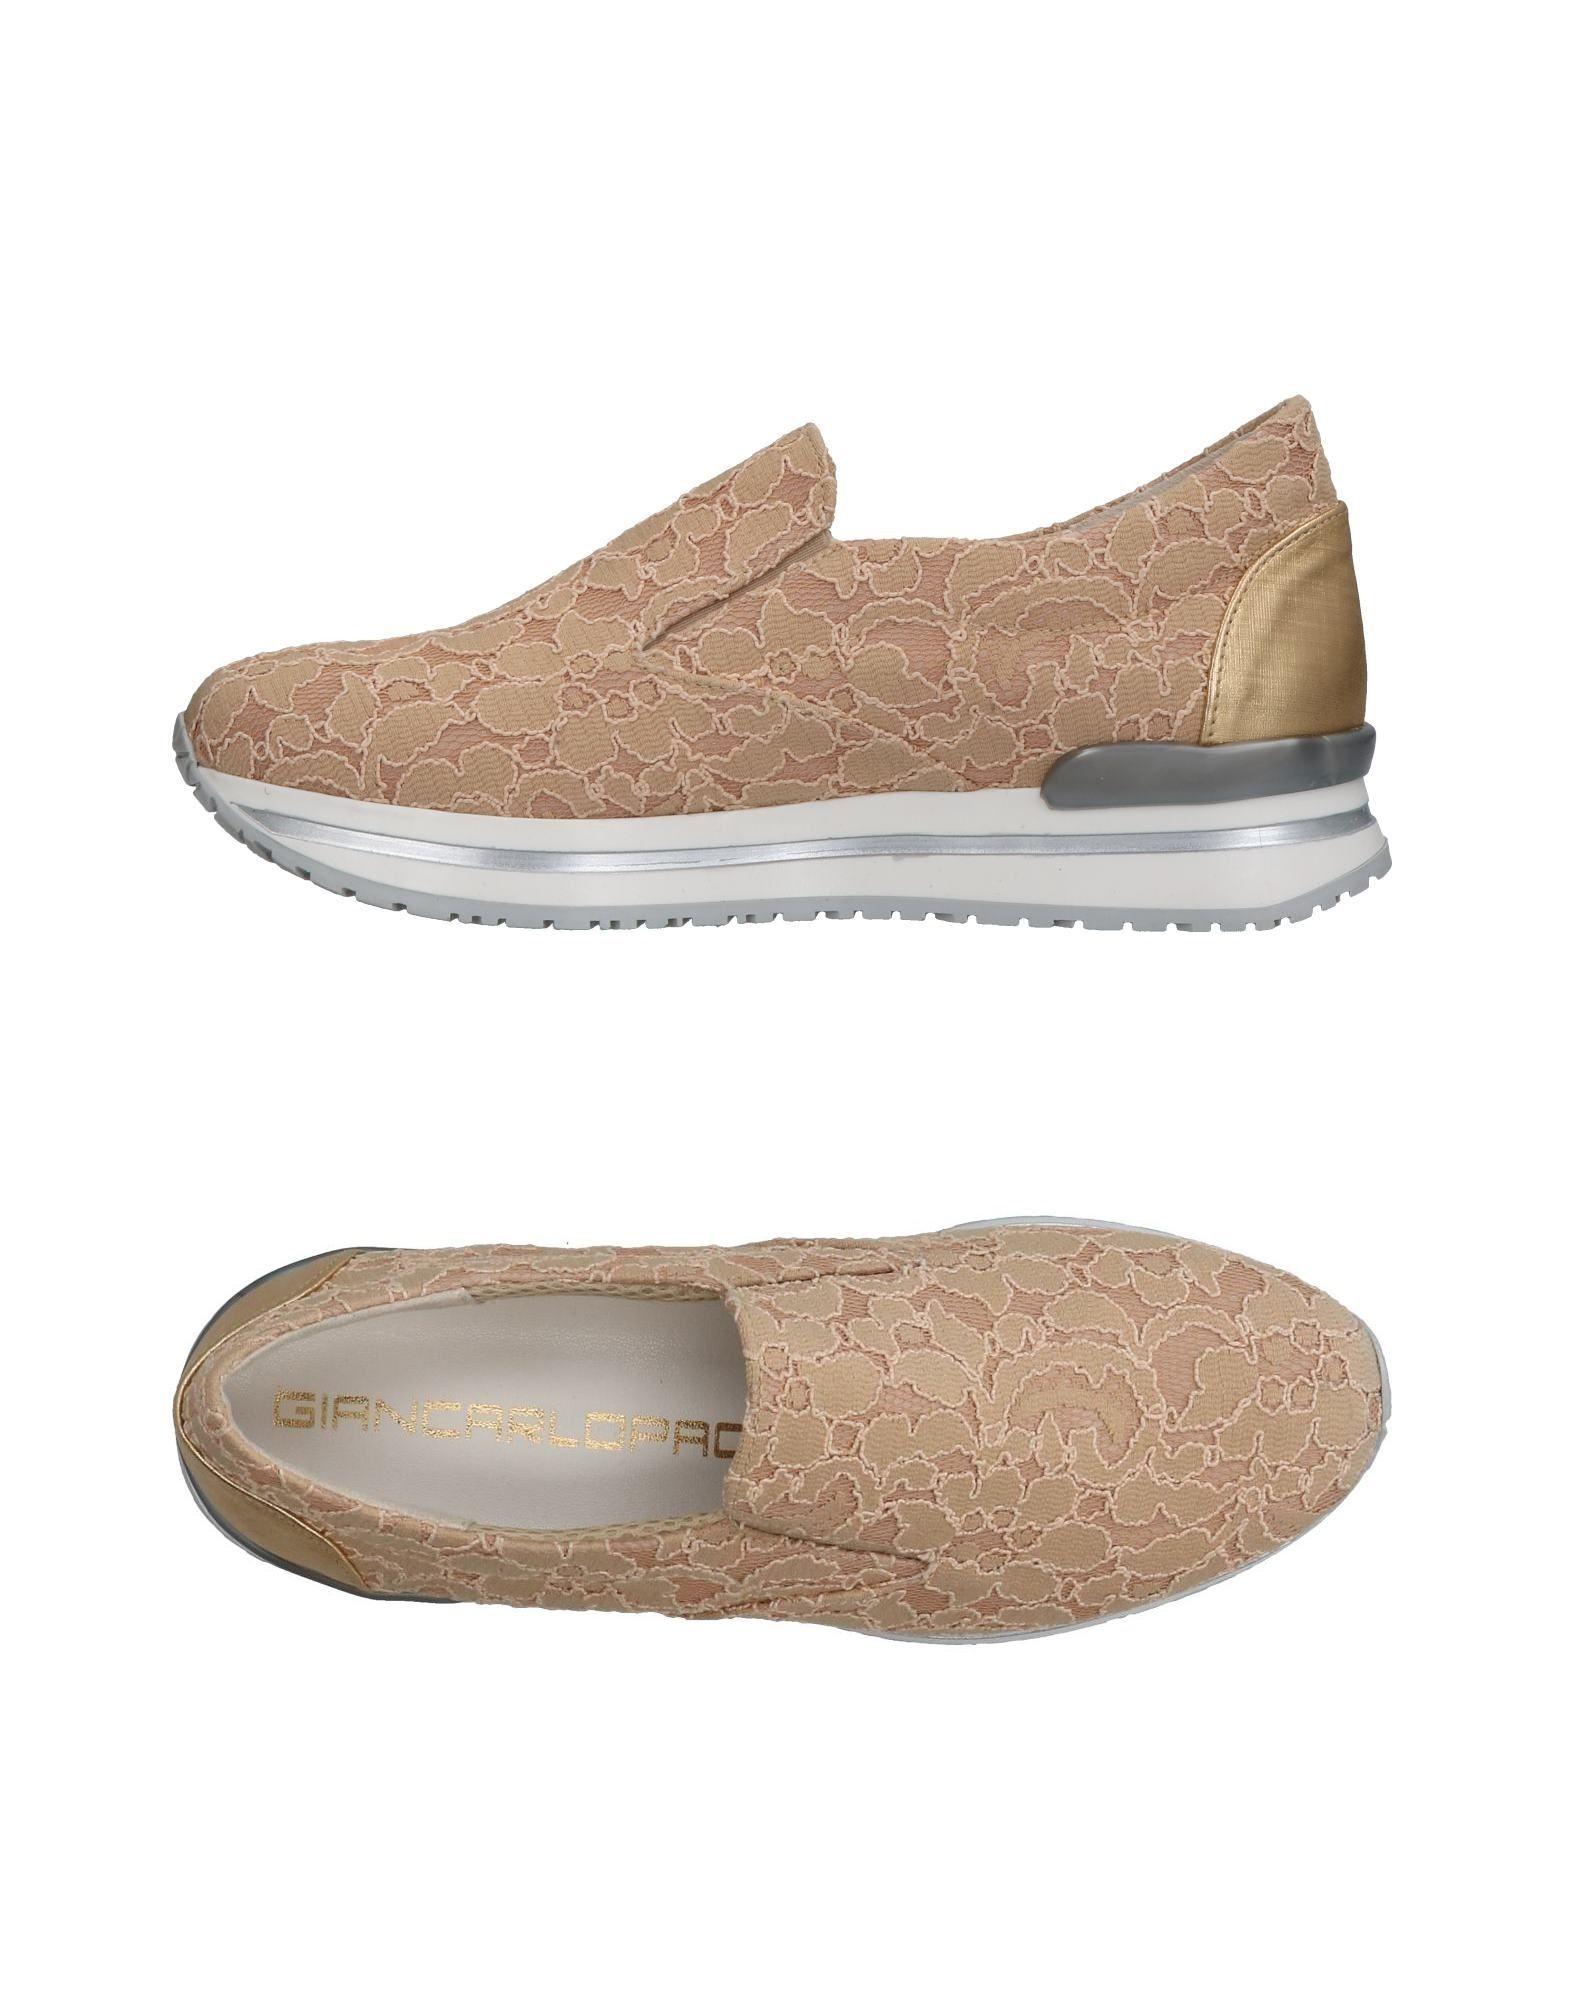 Giancarlo Paoli Sneakers Damen  11338929KM Gute Qualität beliebte Schuhe